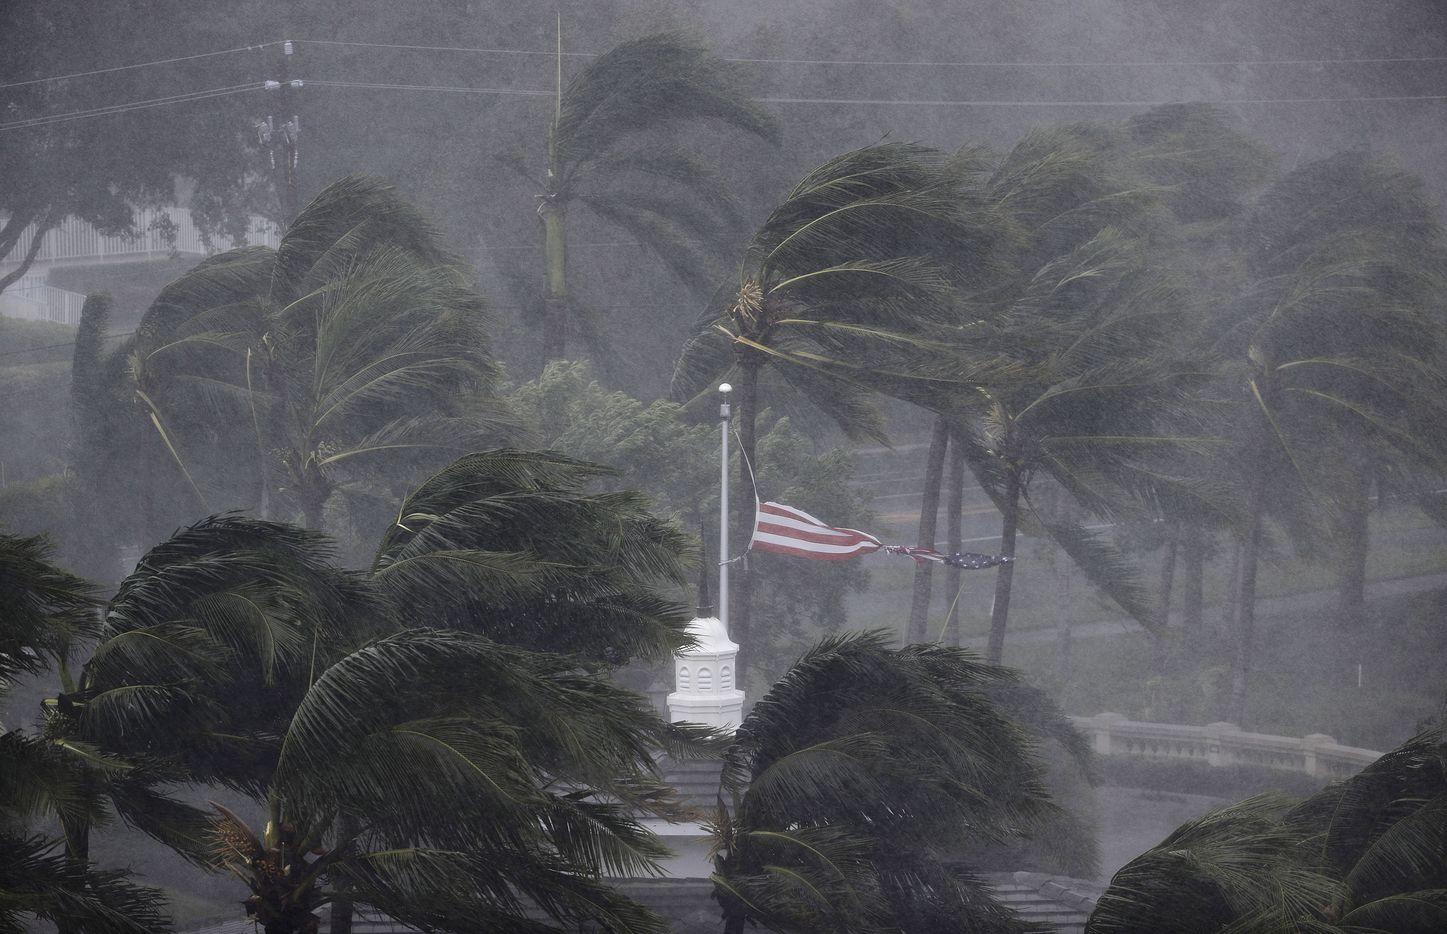 An American flag is torn as Hurricane Irma passes through Naples, Fla., Sunday, Sept. 10, 2017.